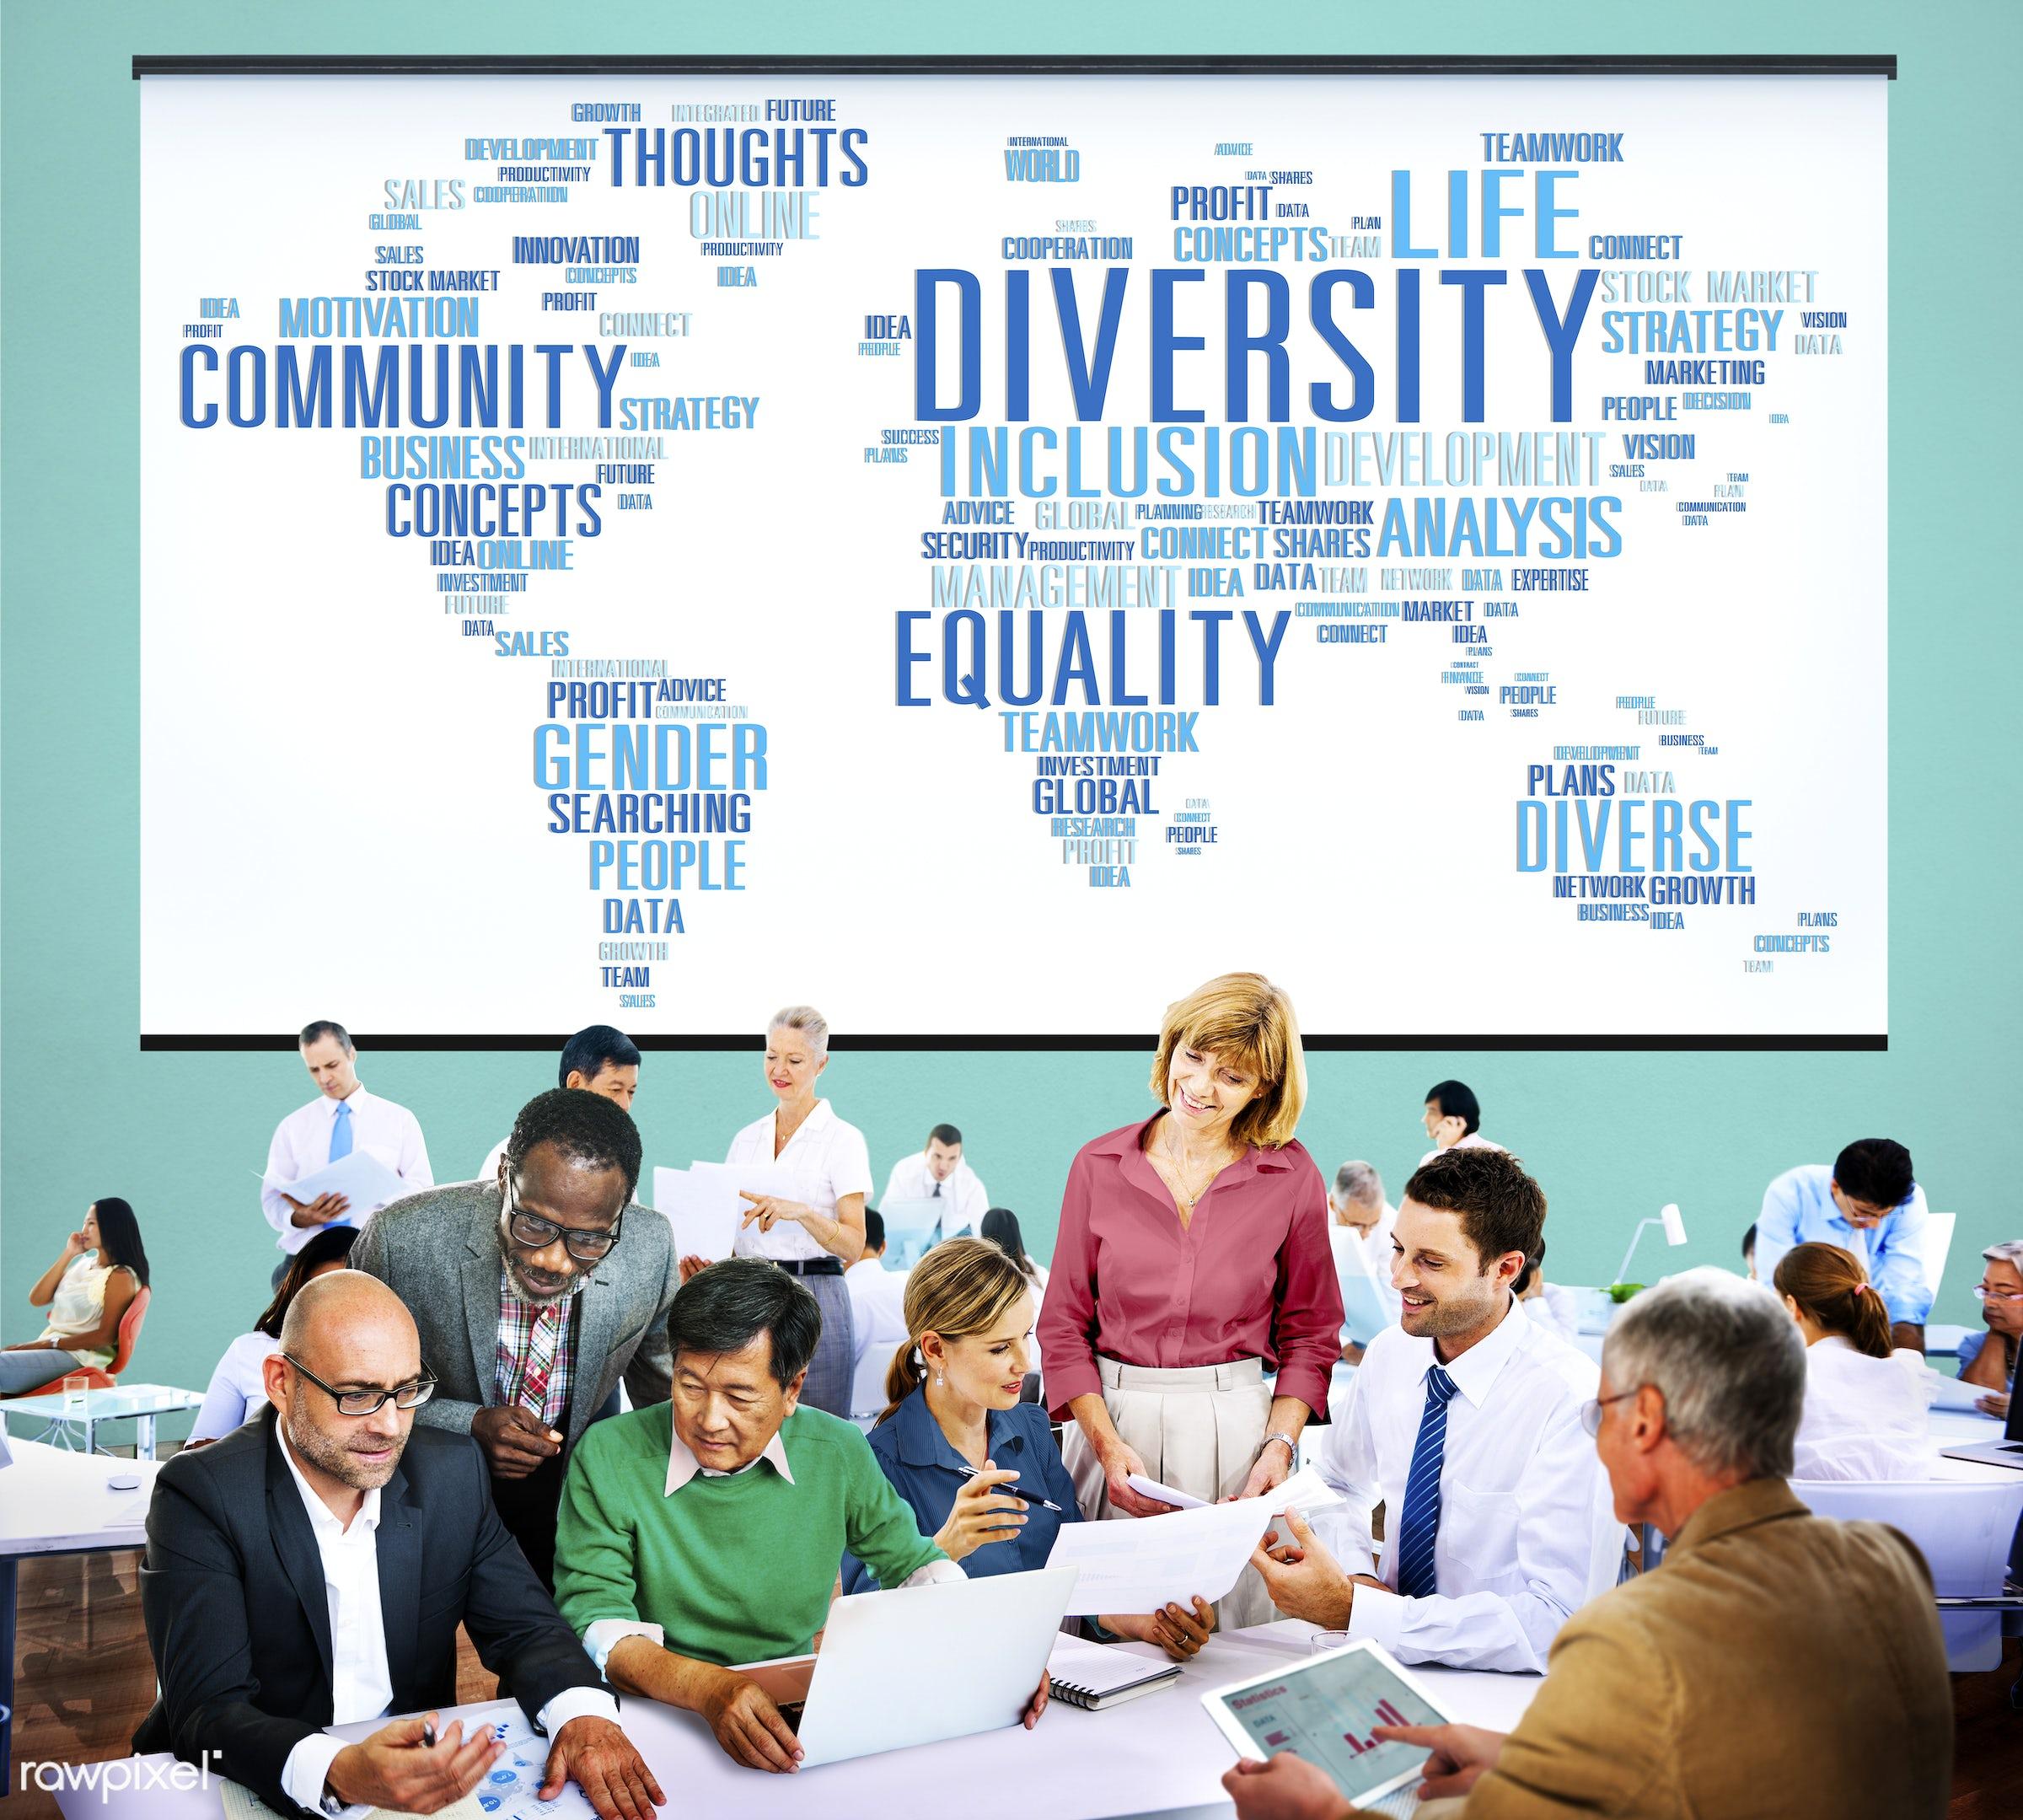 analysis, business, business people, businessmen, businesswomen, busy, cartography, communication, community, conversation,...